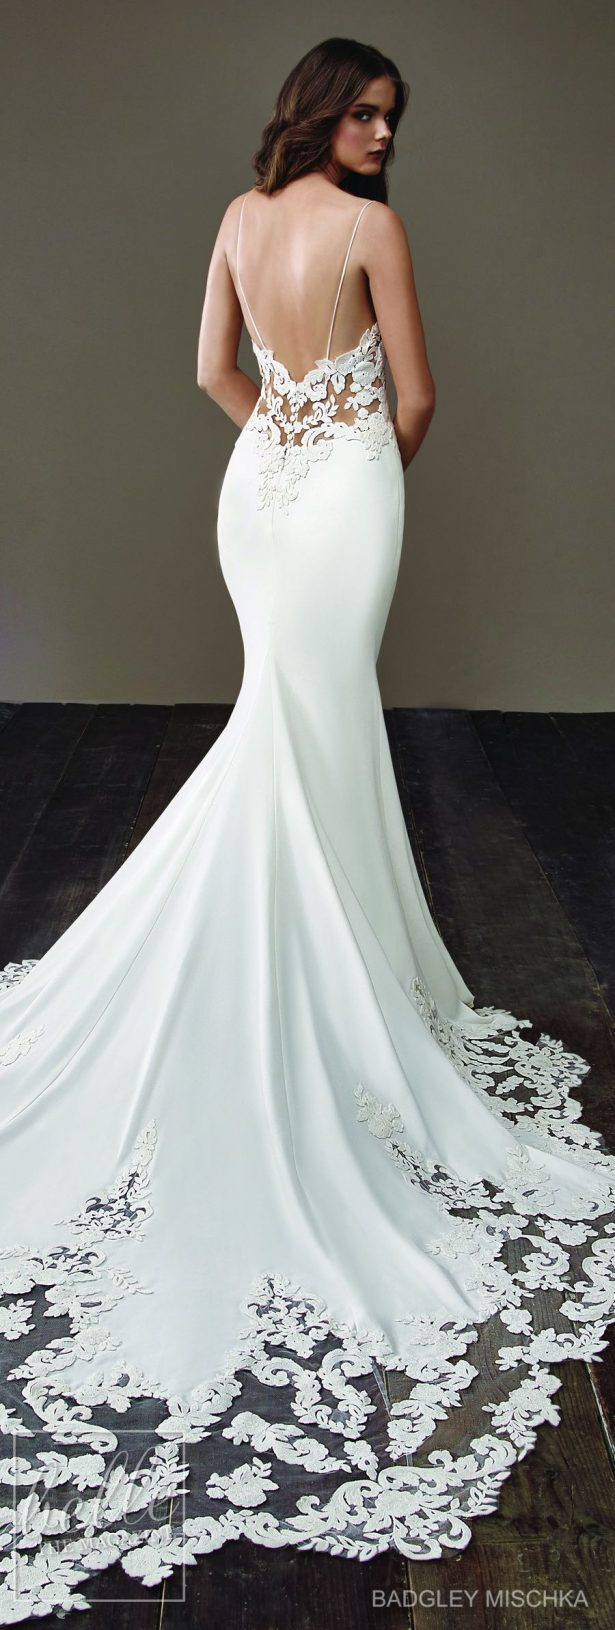 Wedding Dresses by Badgley Mischka Bride 2018 Collection